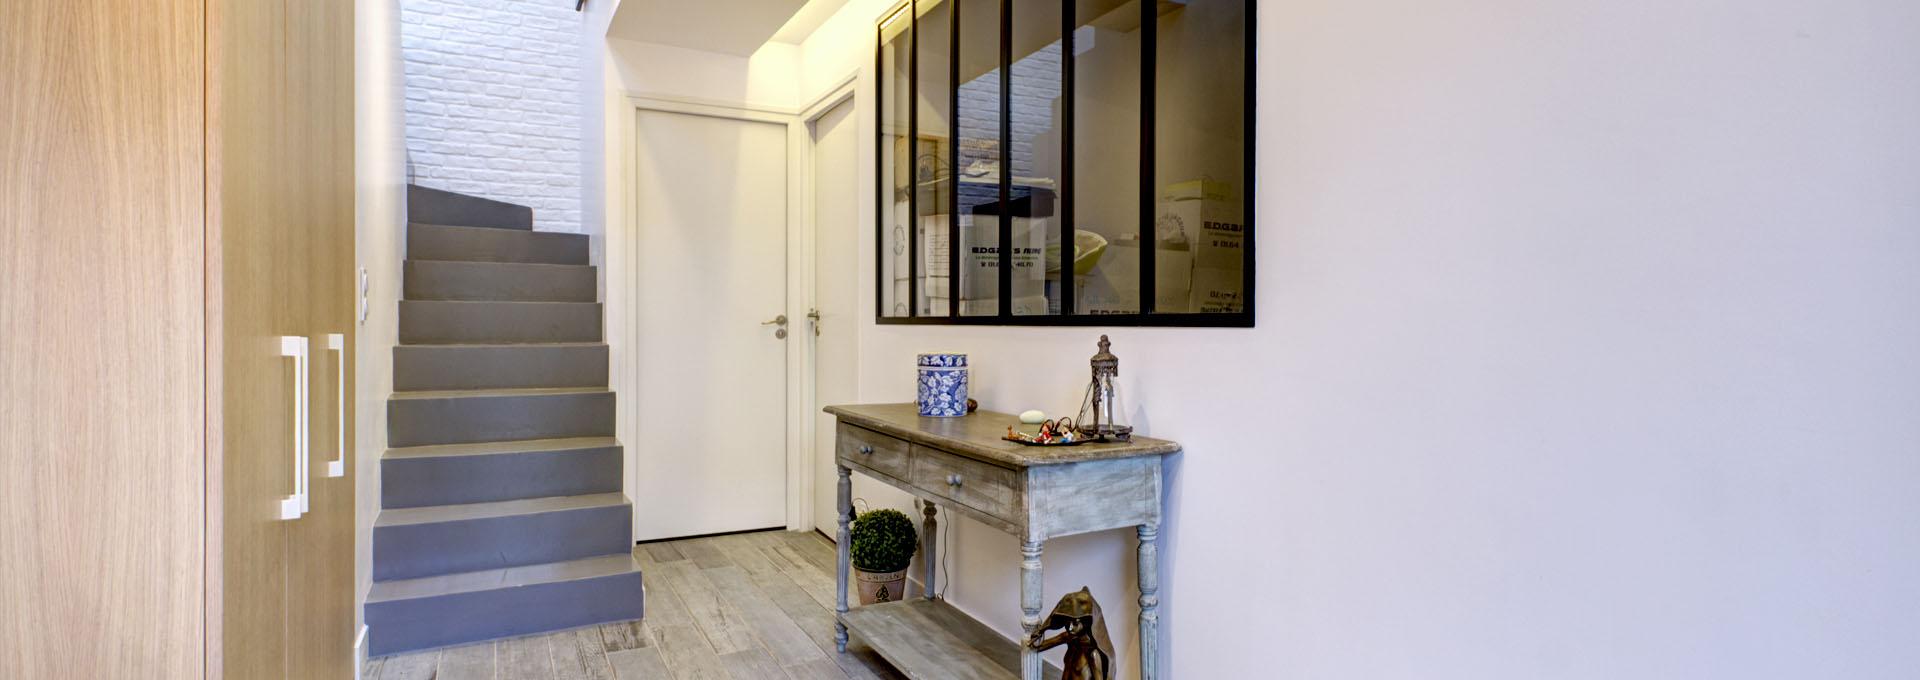 P_Agence_Avous_Rehabilitation_Hangar_Loft_Region_parisienne_escalier_beton